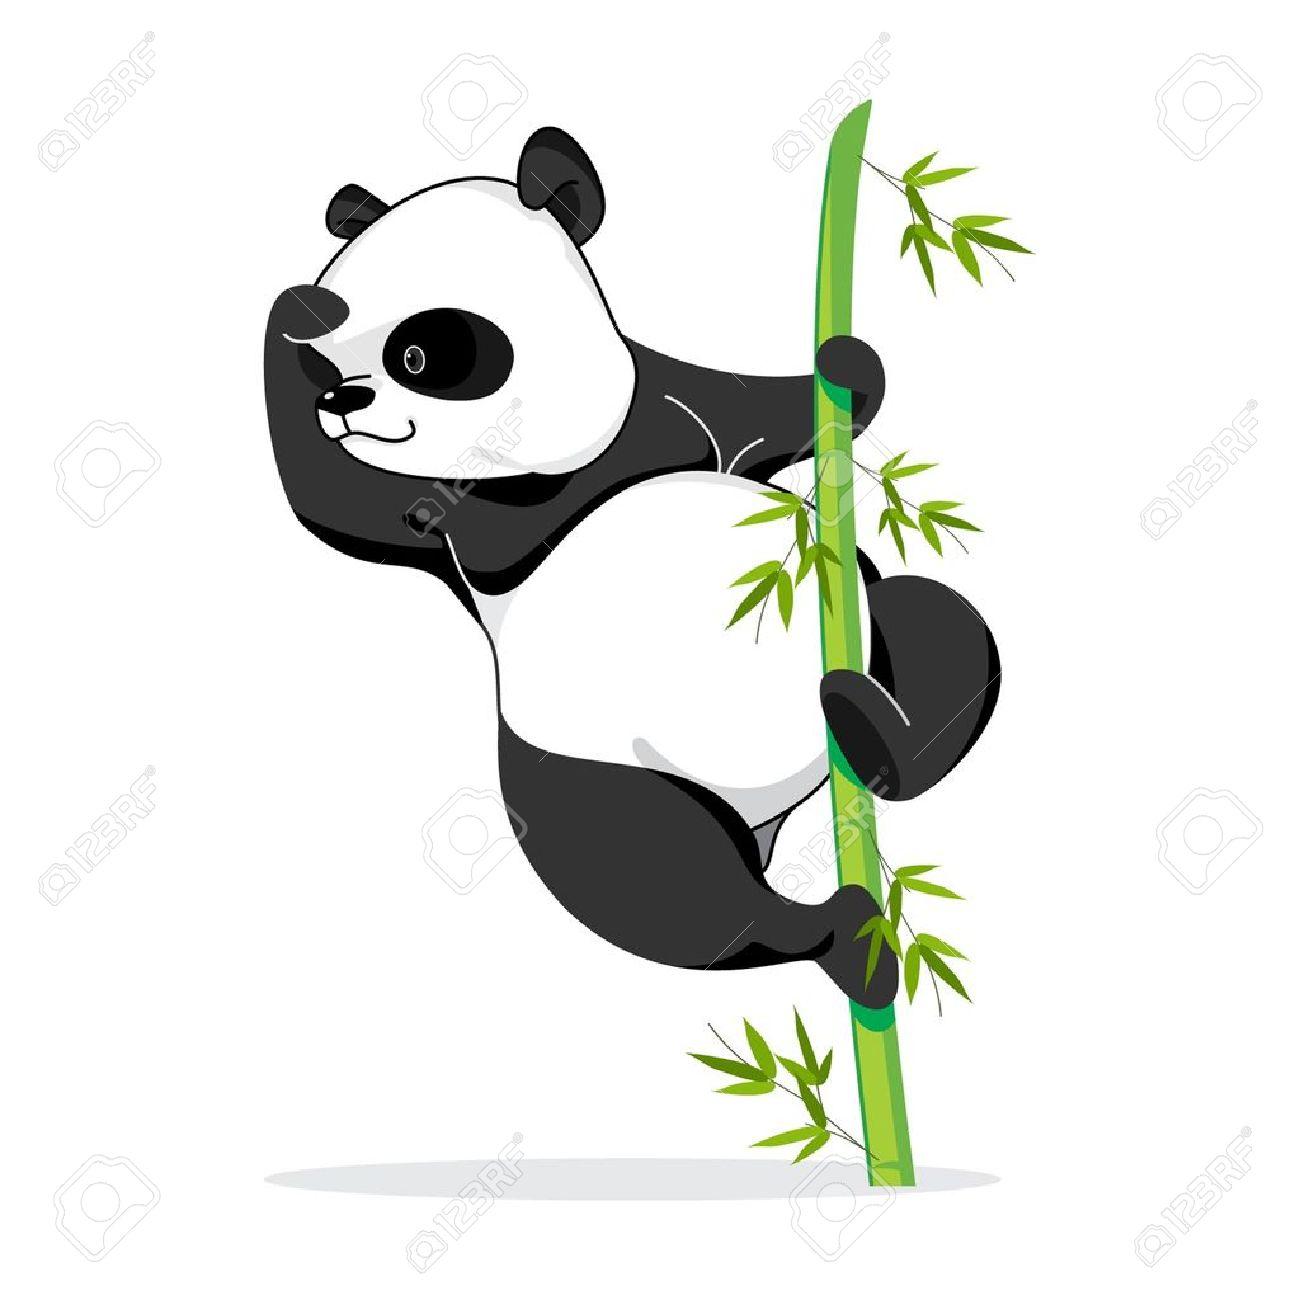 Illustration Of Panda Pose It Climbing A Bamboo To See Something